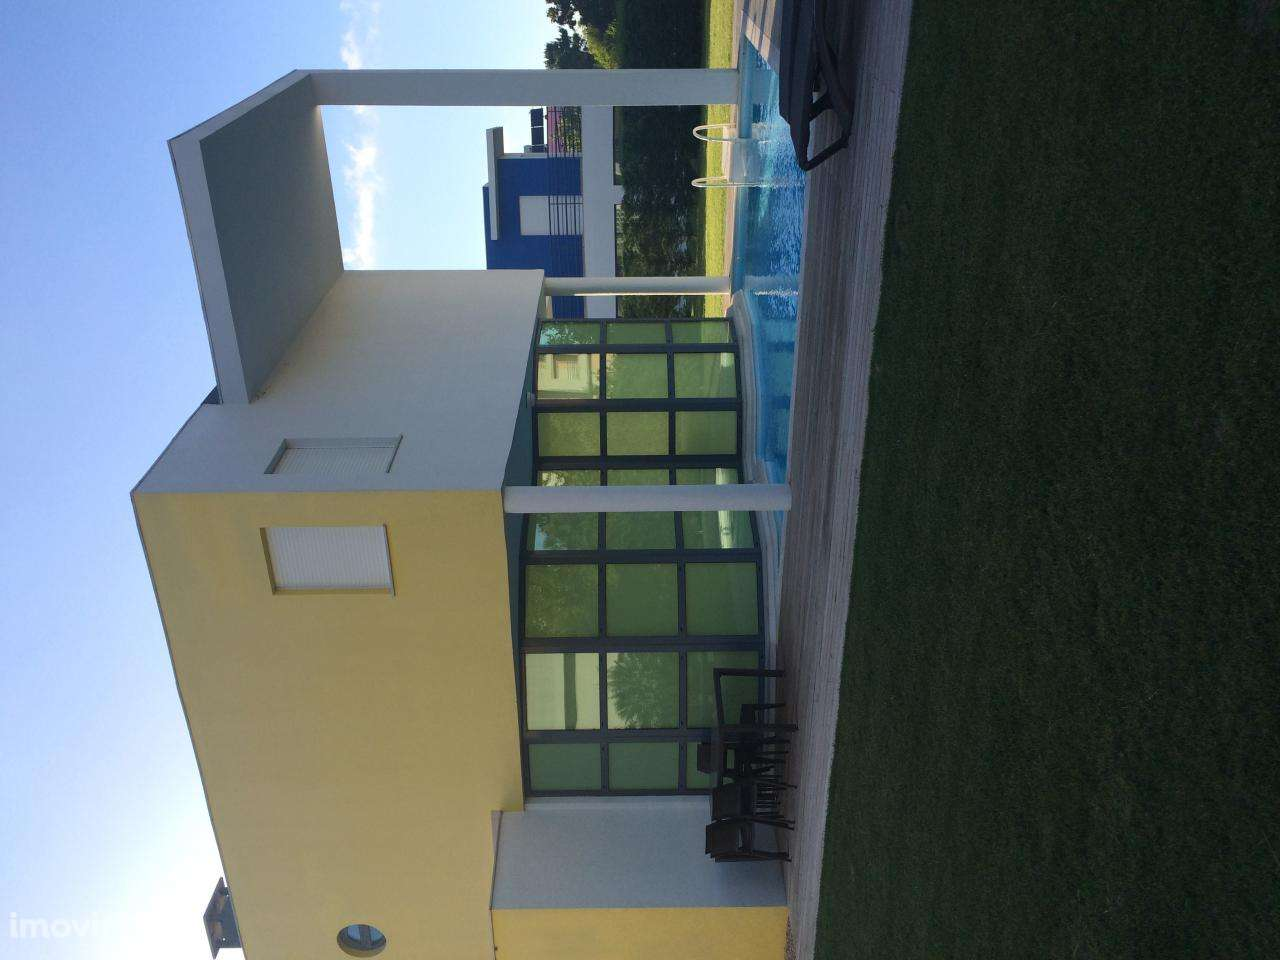 Moradia para arrendar, Quinta do Anjo, Setúbal - Foto 1